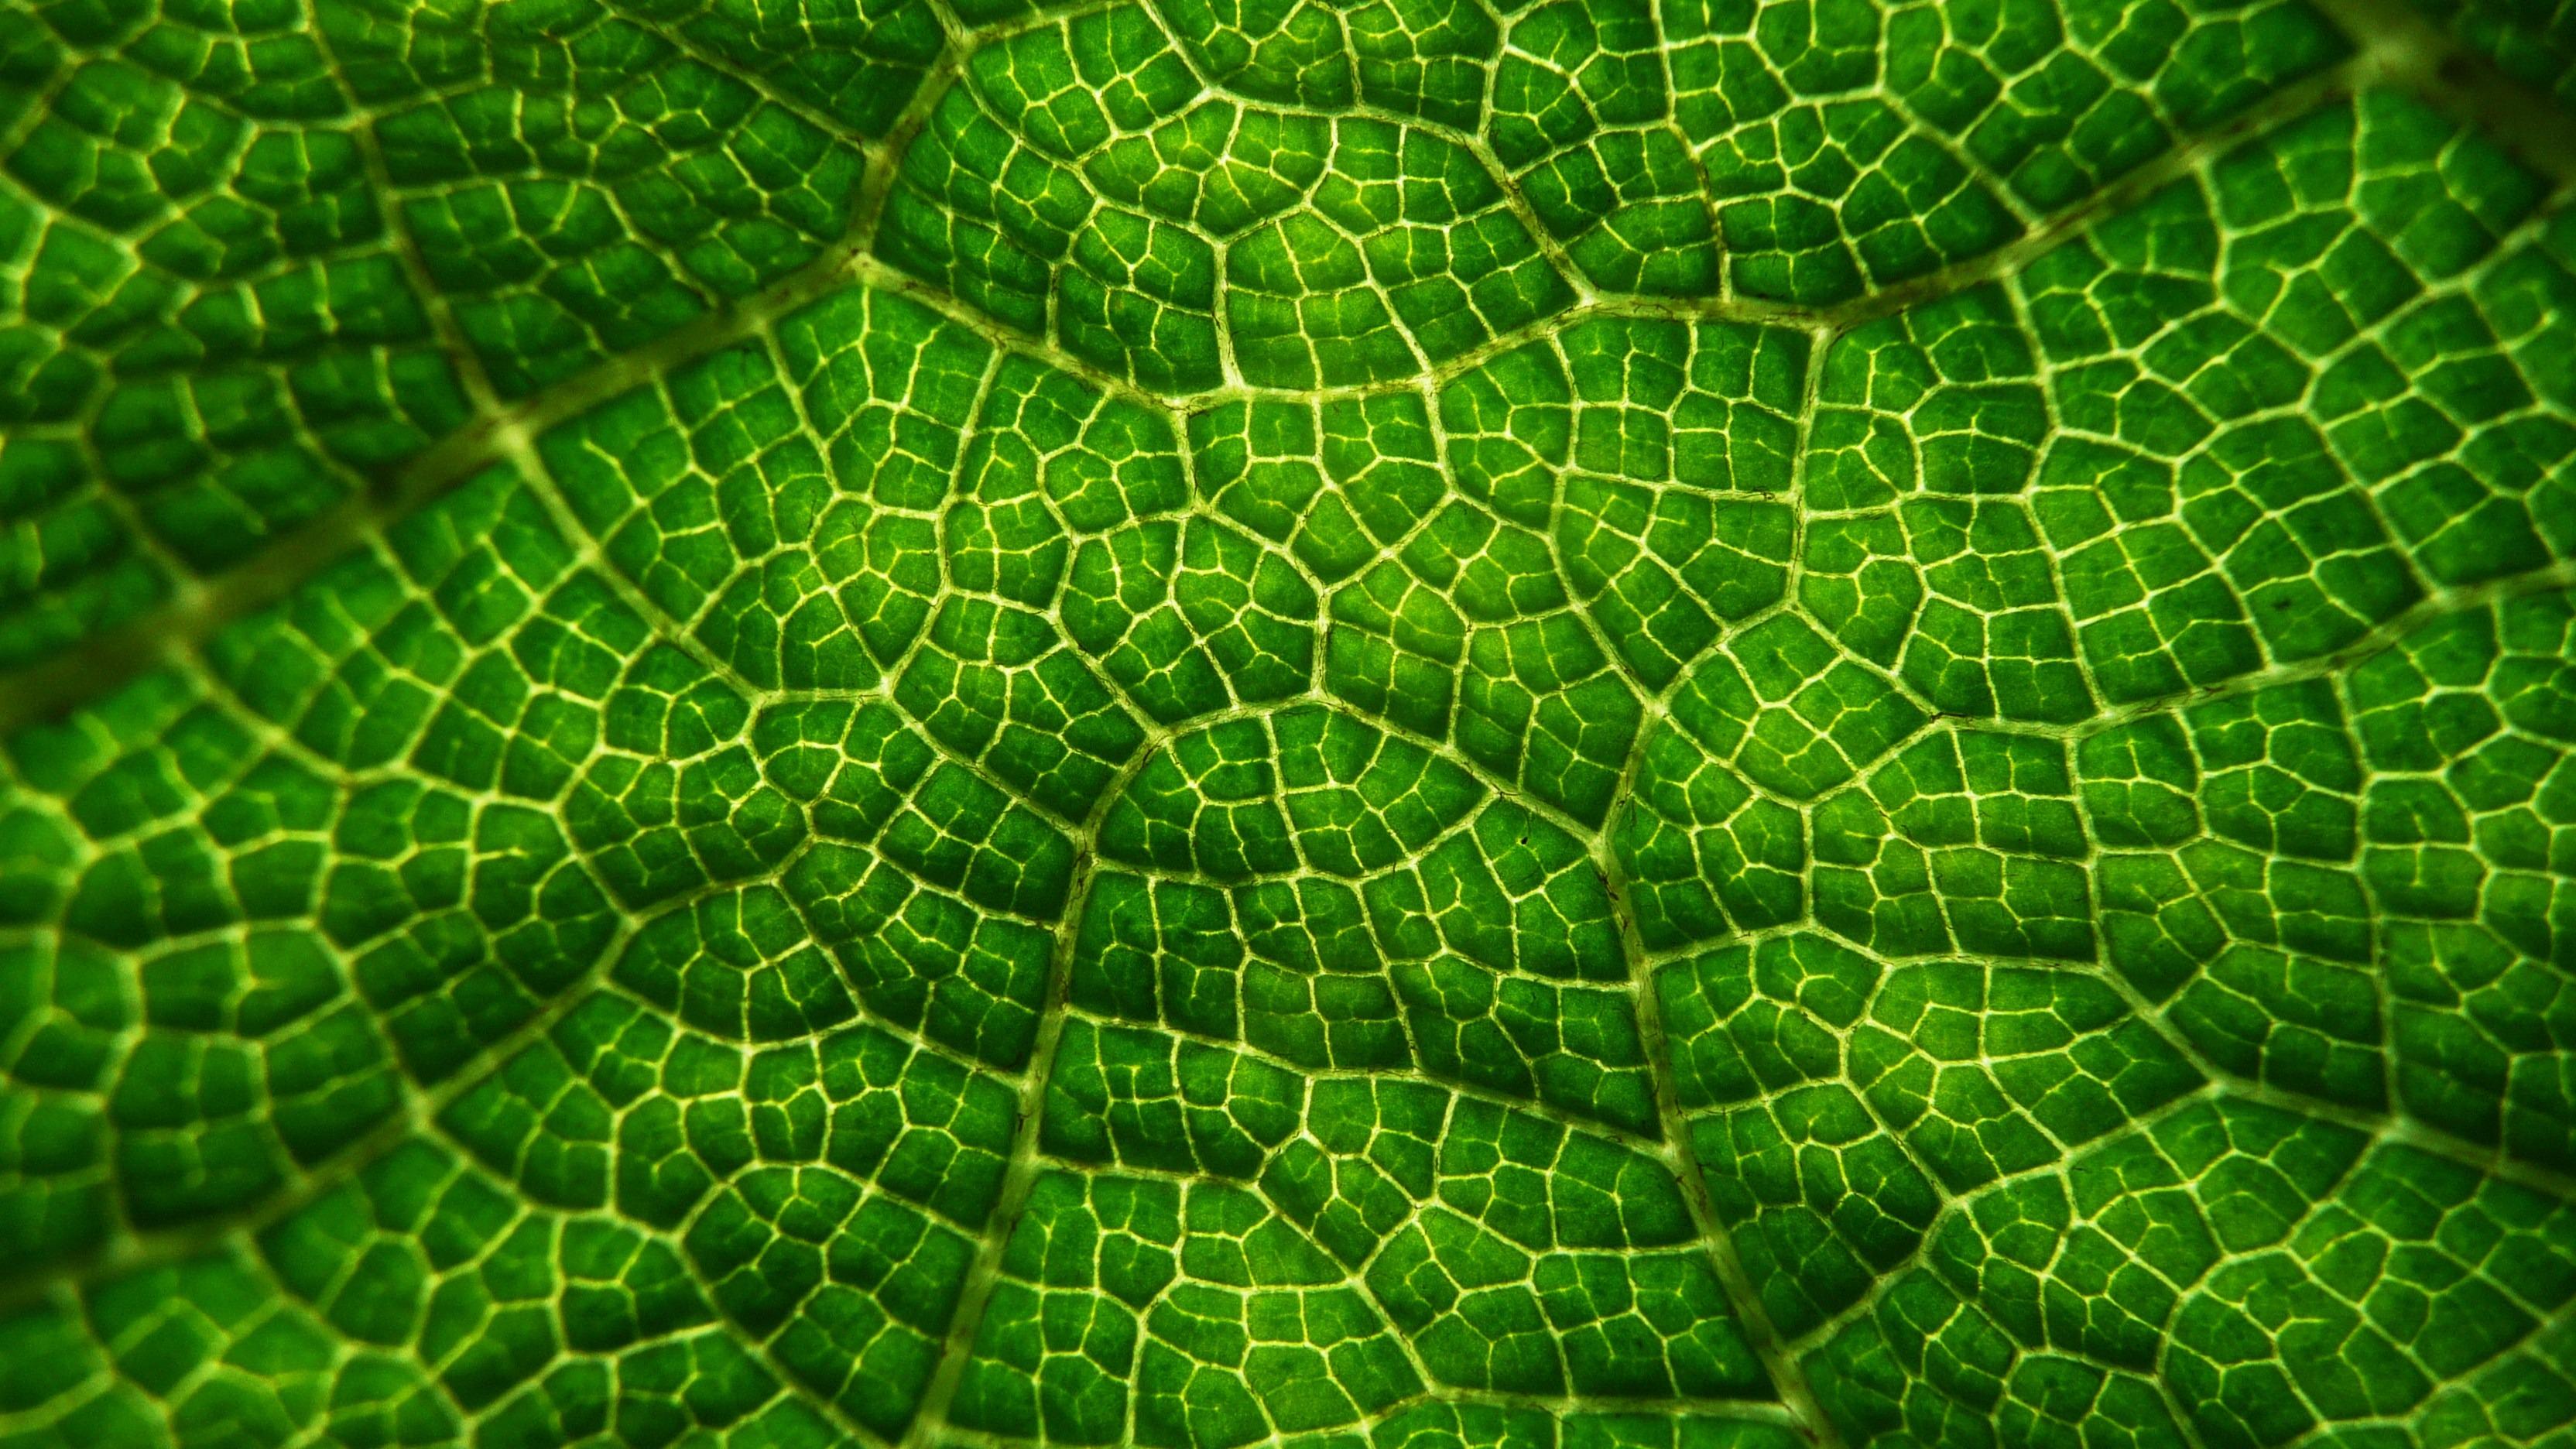 Fotos gratis hoja flor follaje patr n verde vistoso for Green pflanzen